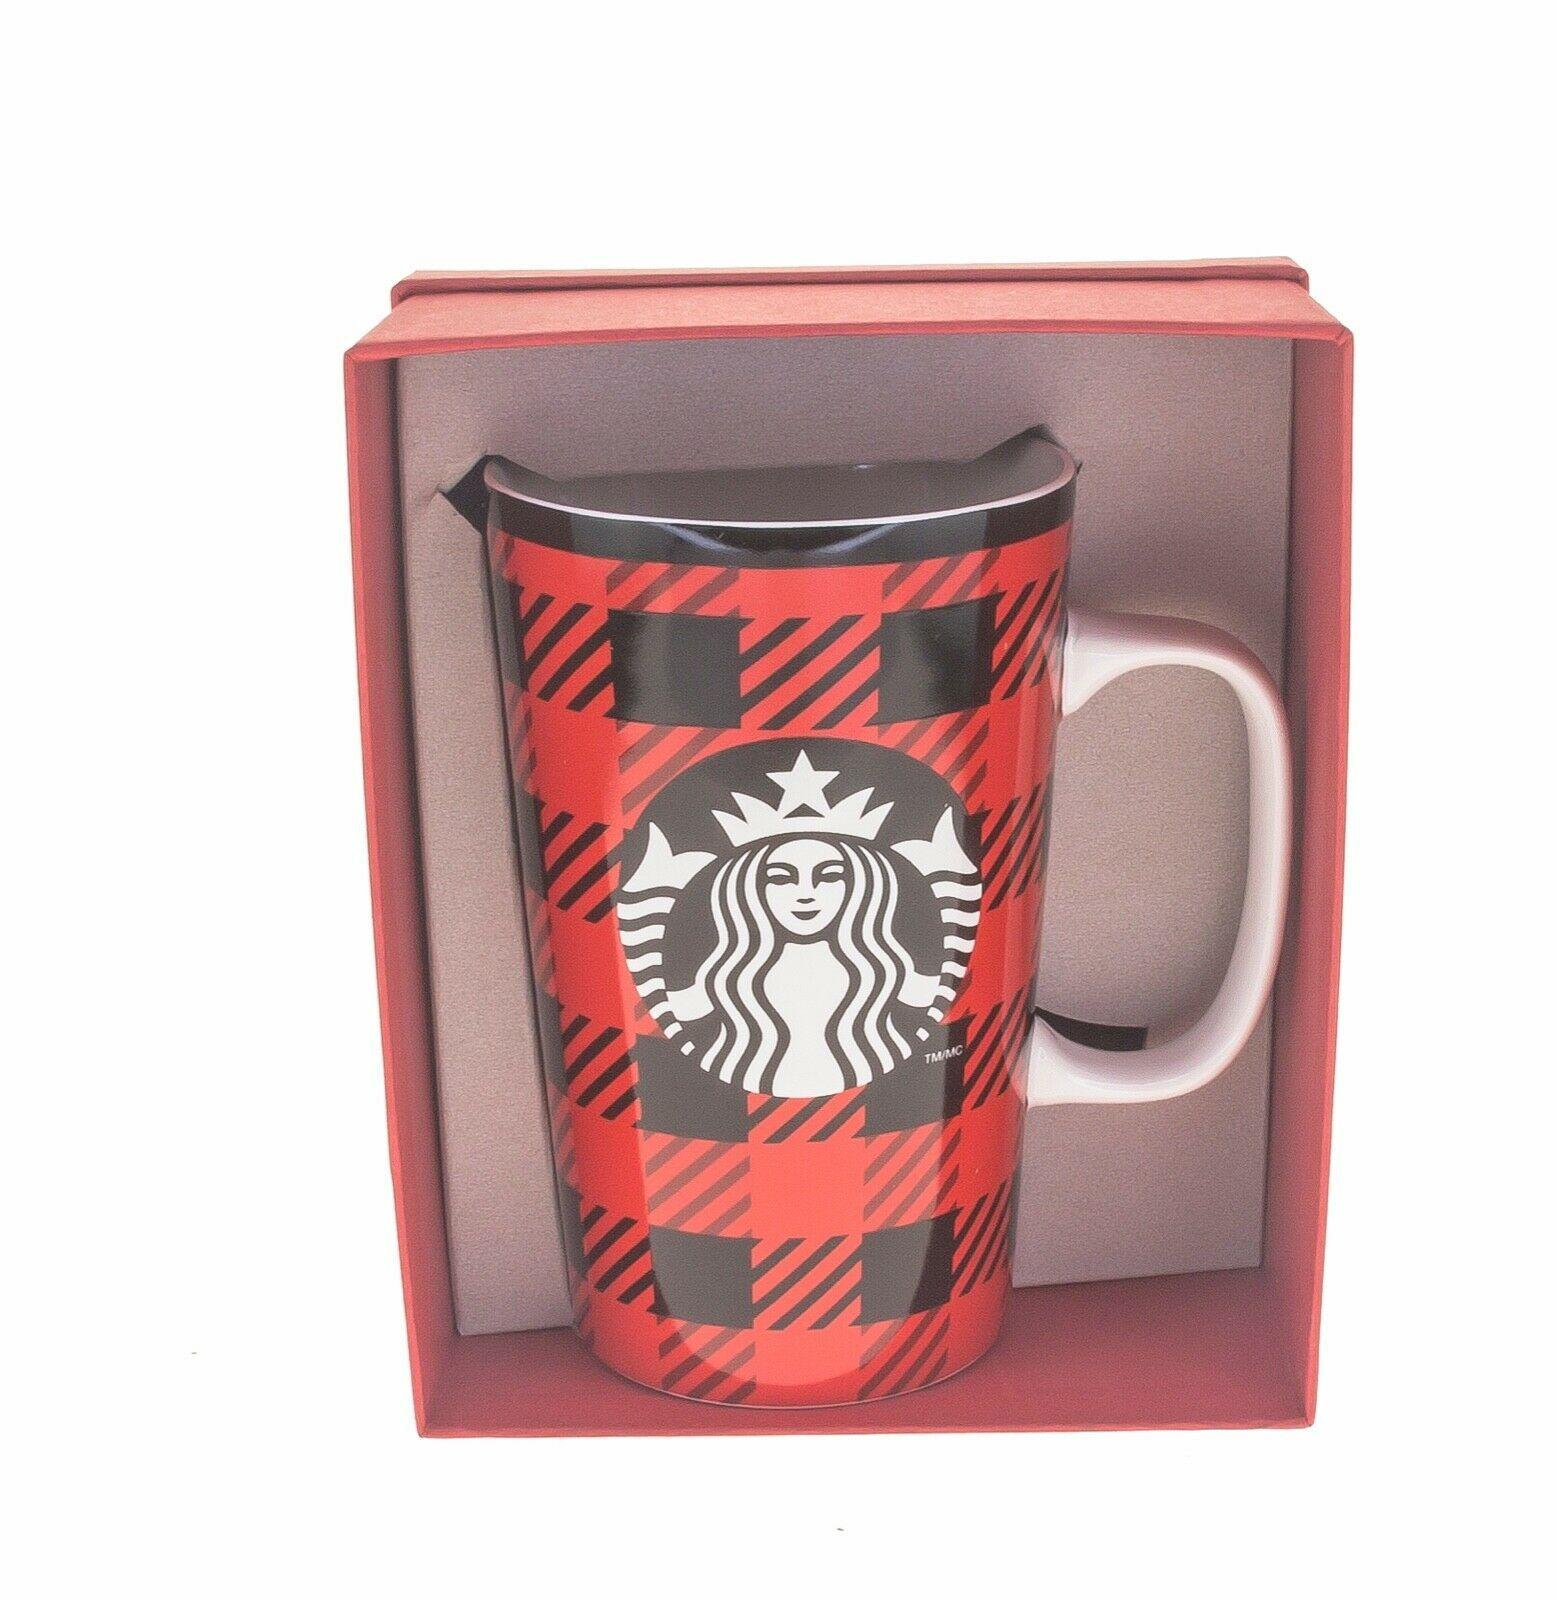 Starbucks Tartan Plaid Red Black Siren Logo Ceramic Tall Mug Handle 16oz DOT - $41.57